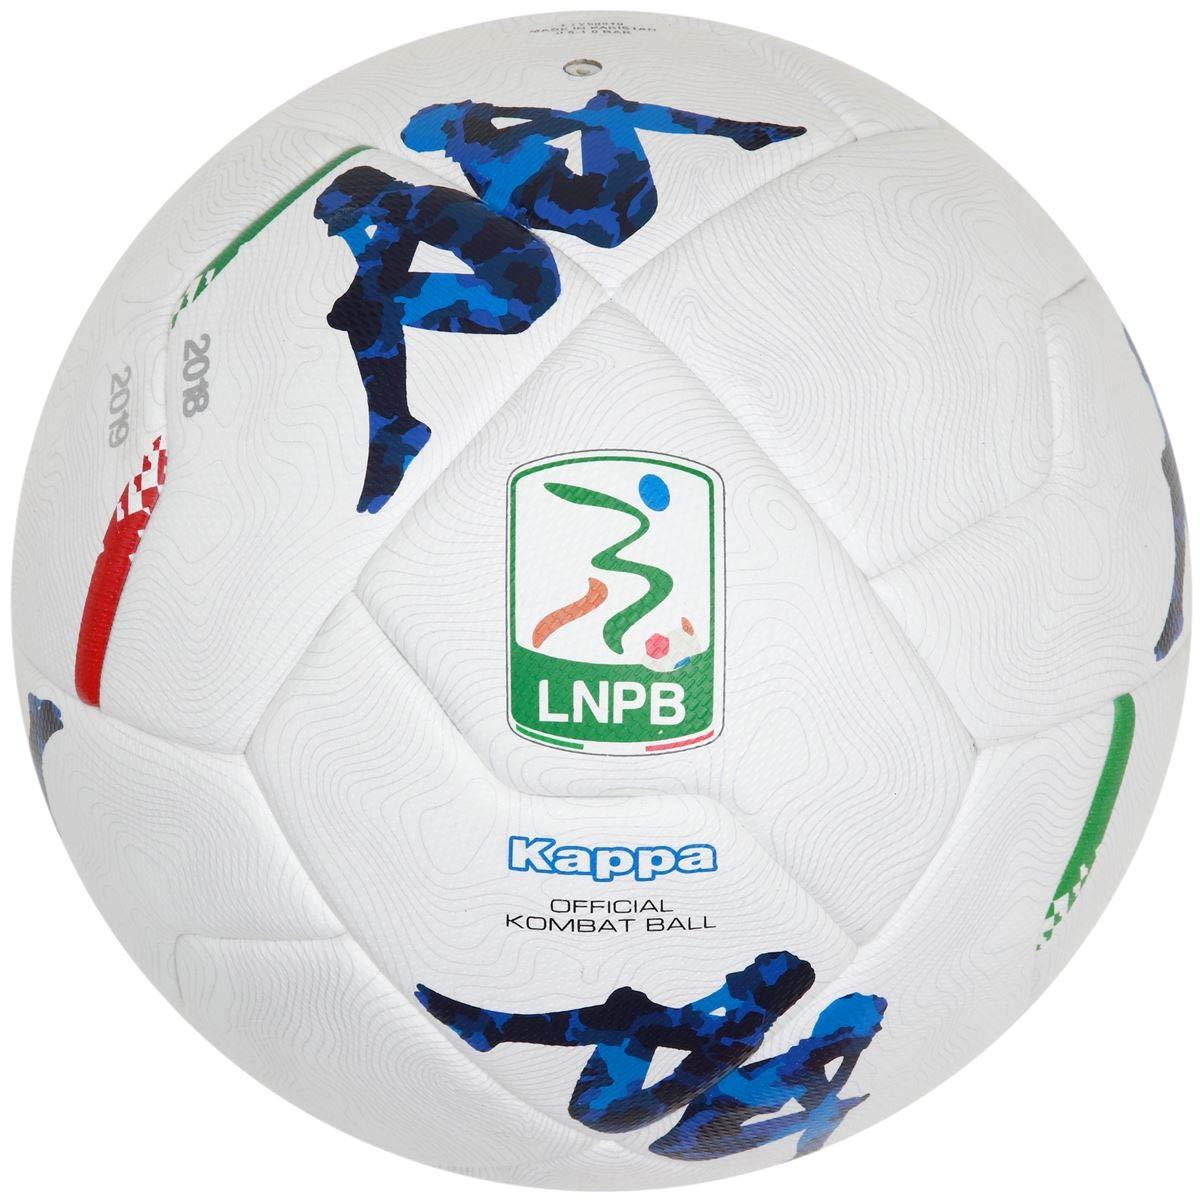 Kappa balón de fútbol Fútbol Kombat Serie B Official Ball 2018/19 ...